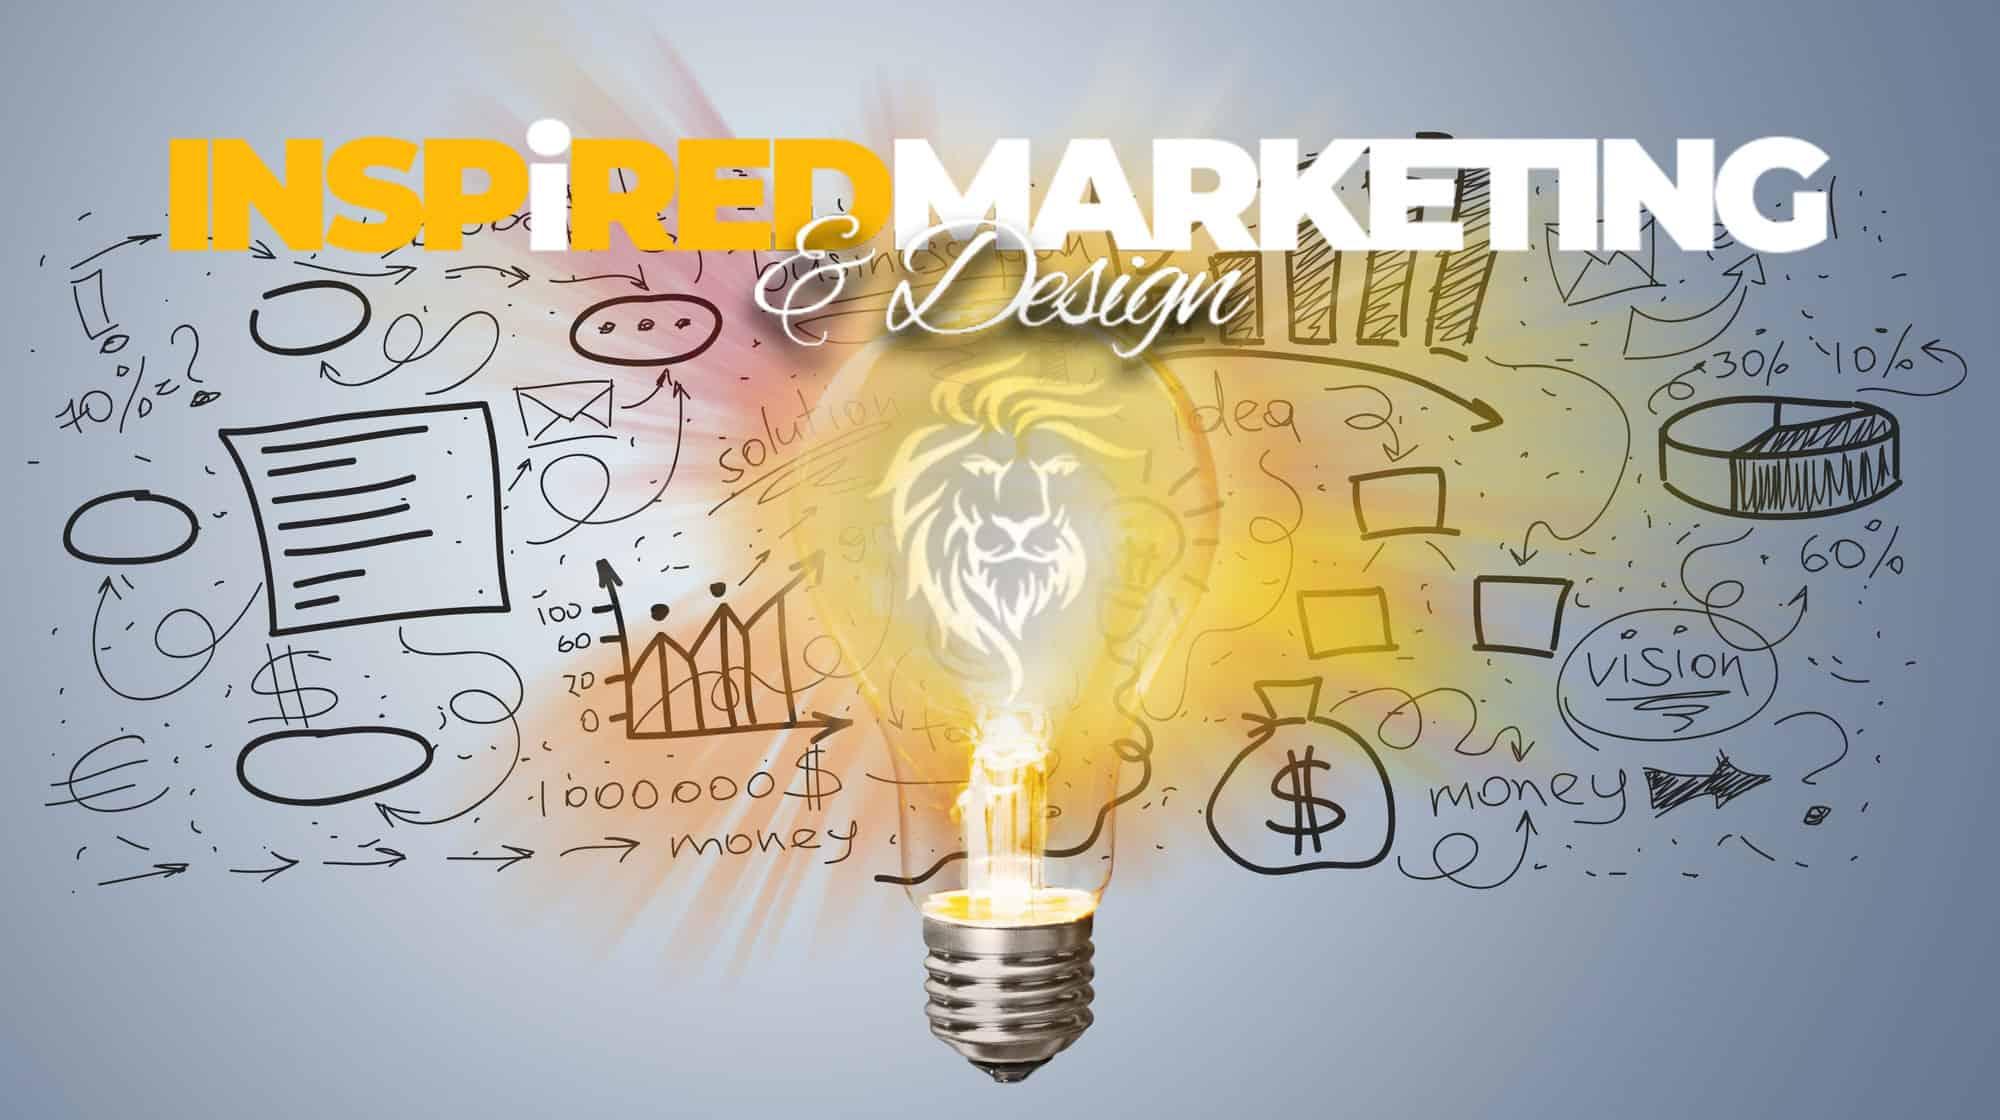 Inspired Marketing & Design Website Designs